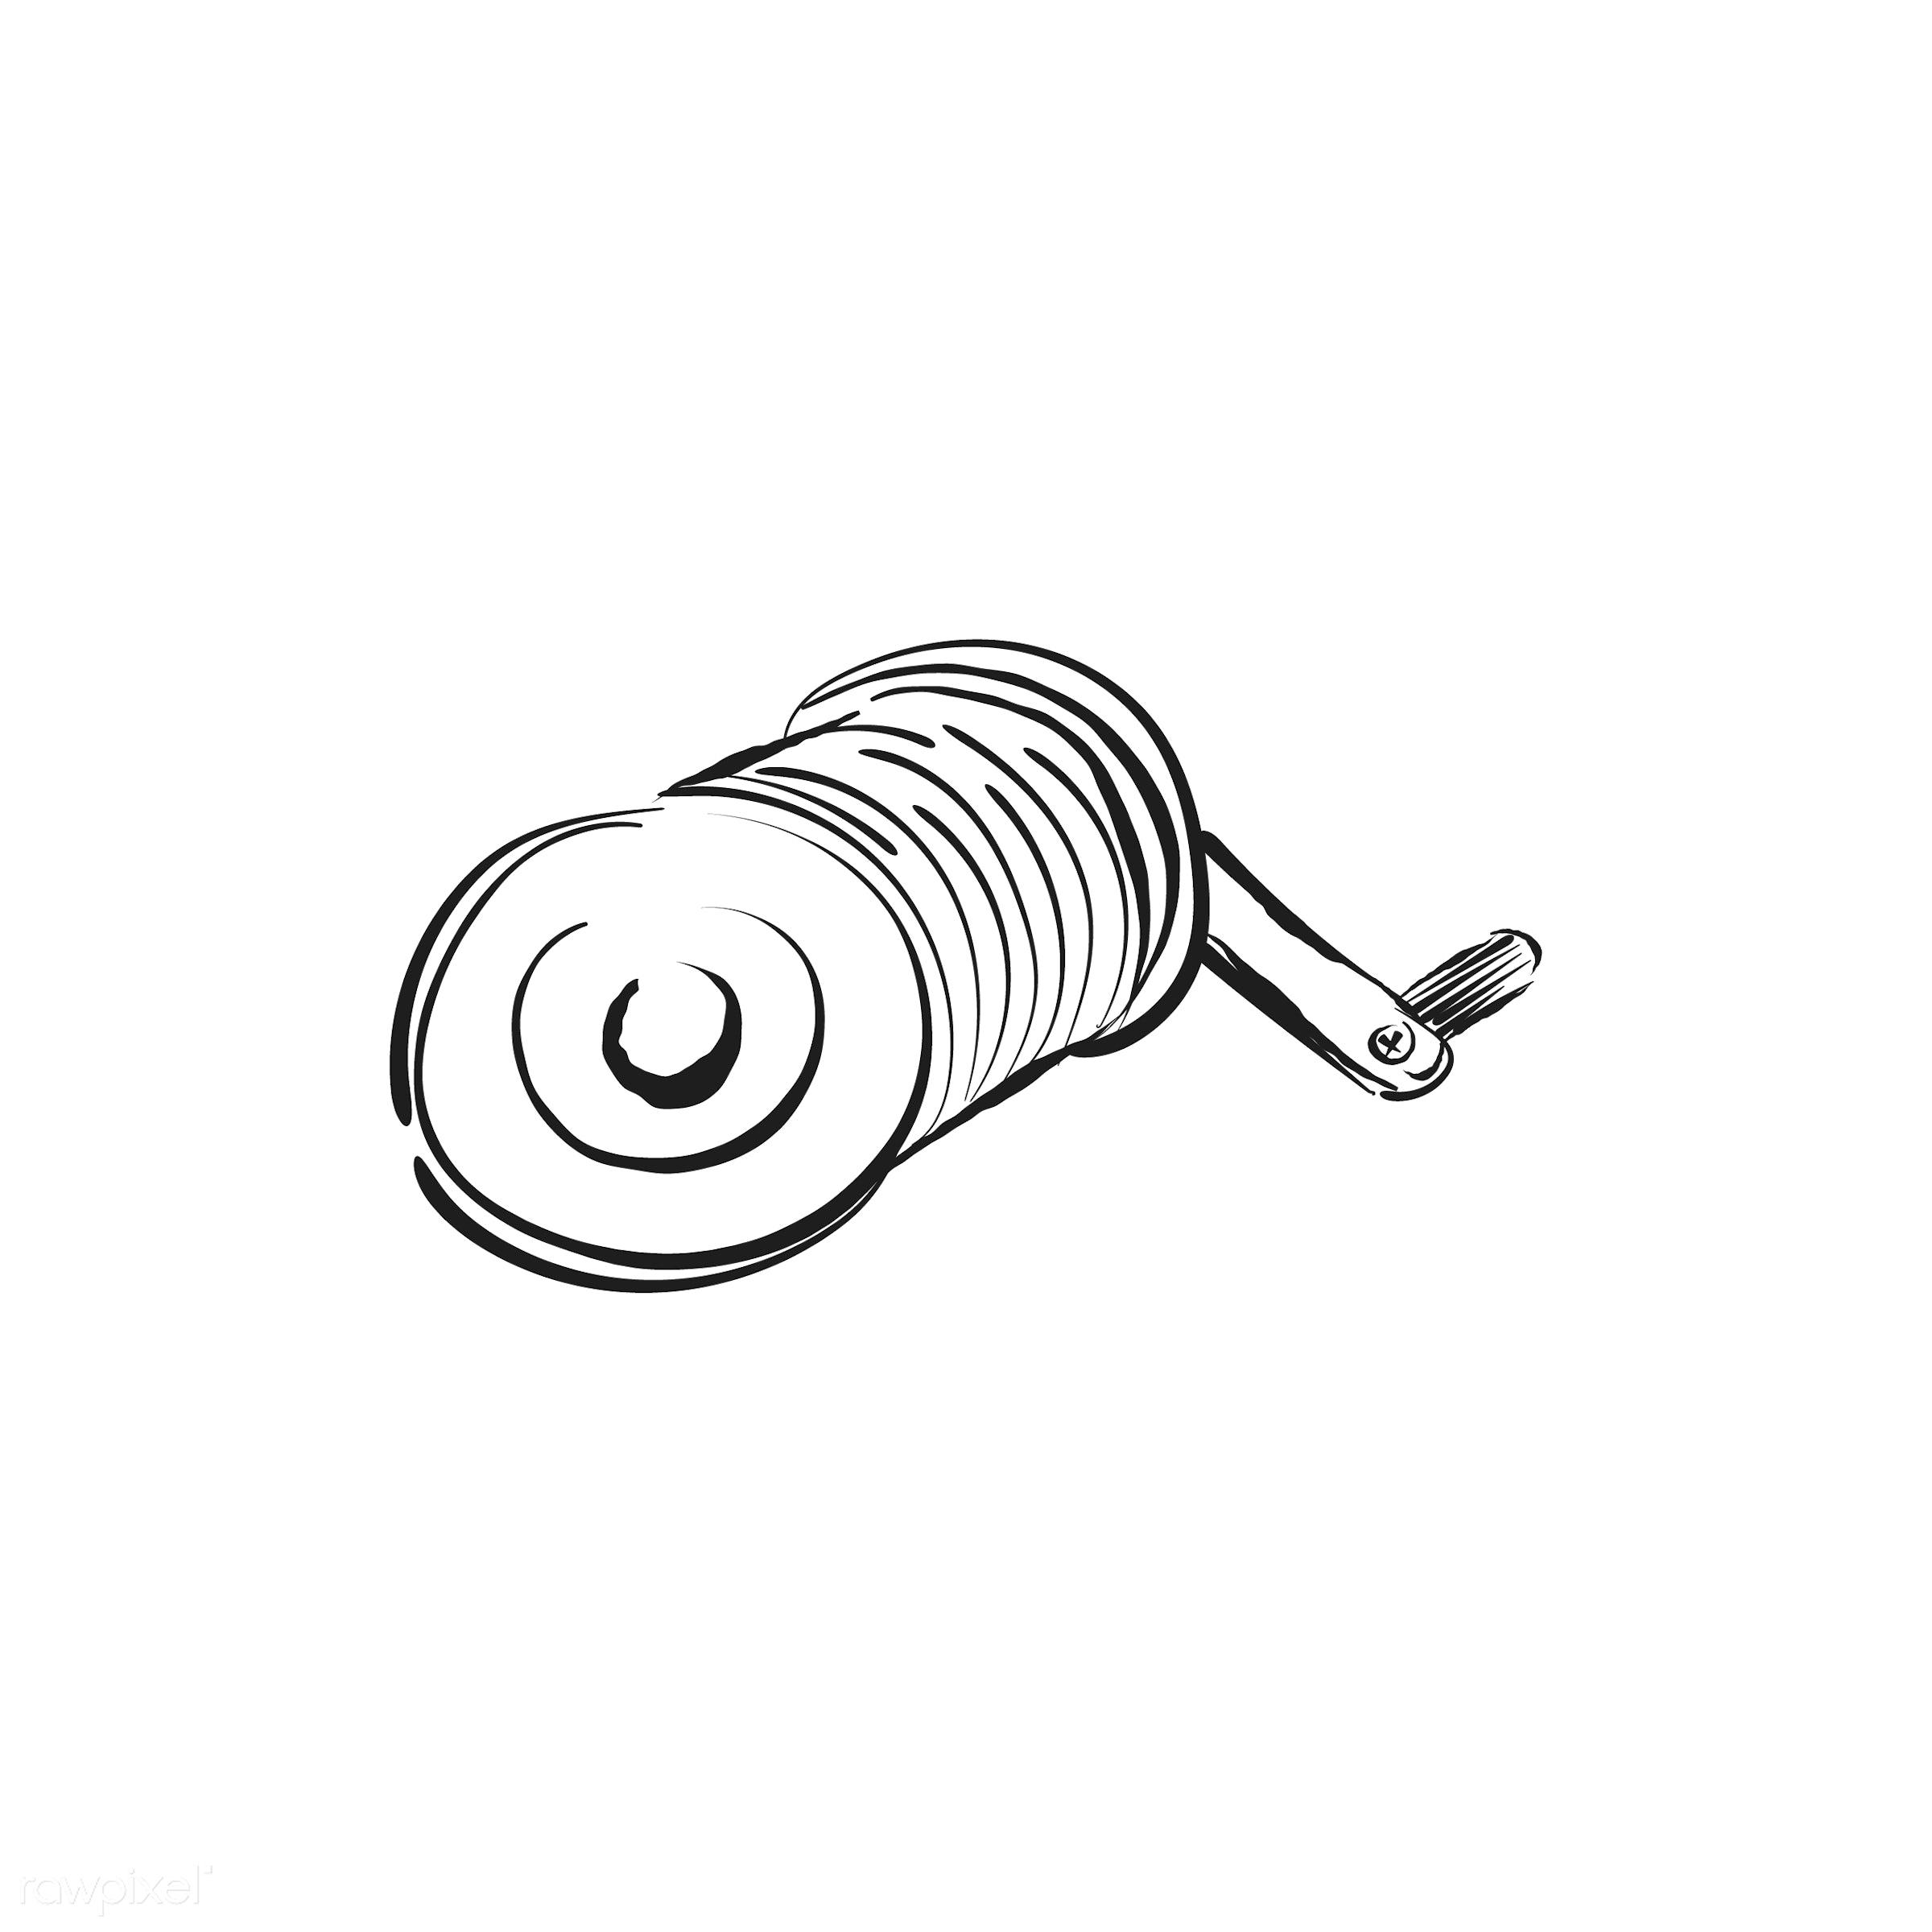 Vintage illustration of a fishing rod spinning reel - antique, black, design, drawing, equipment, fisherman, fishing,...